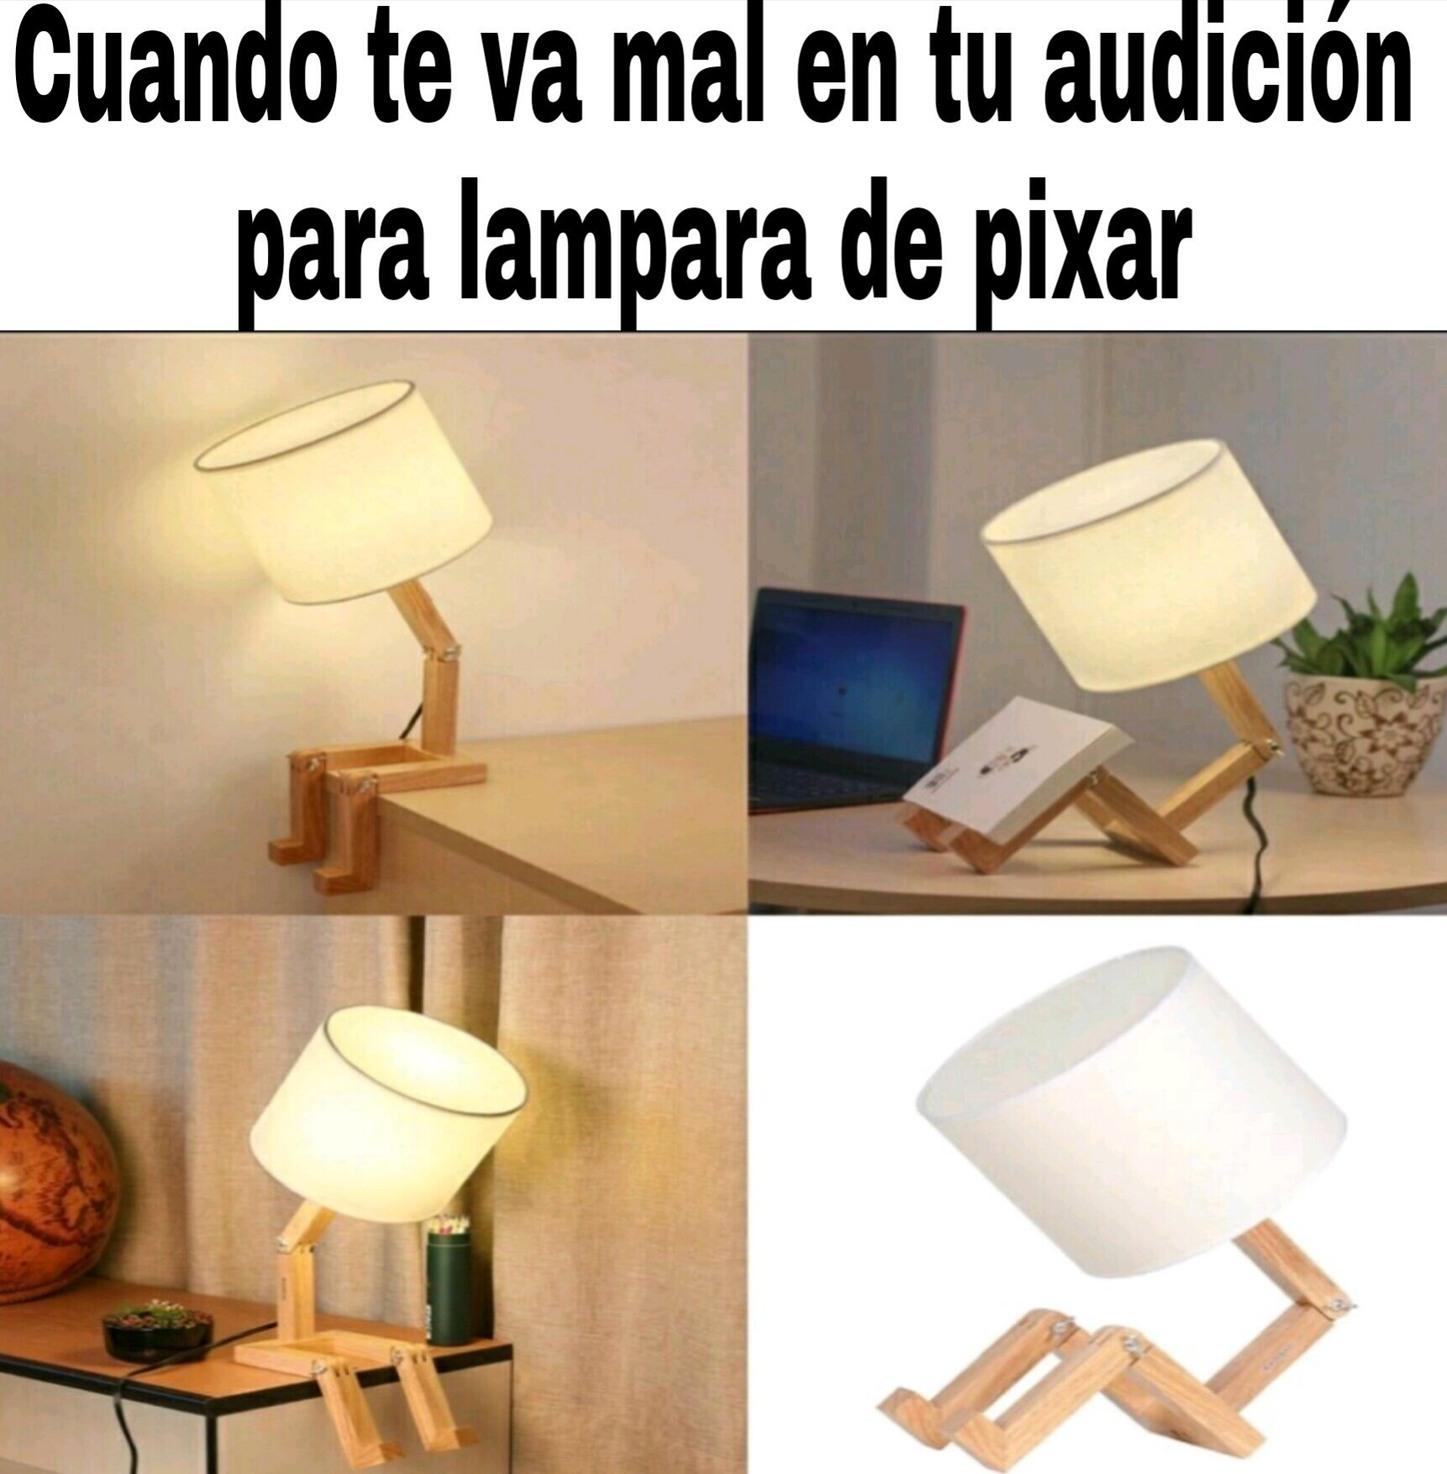 F por la lámpara - meme